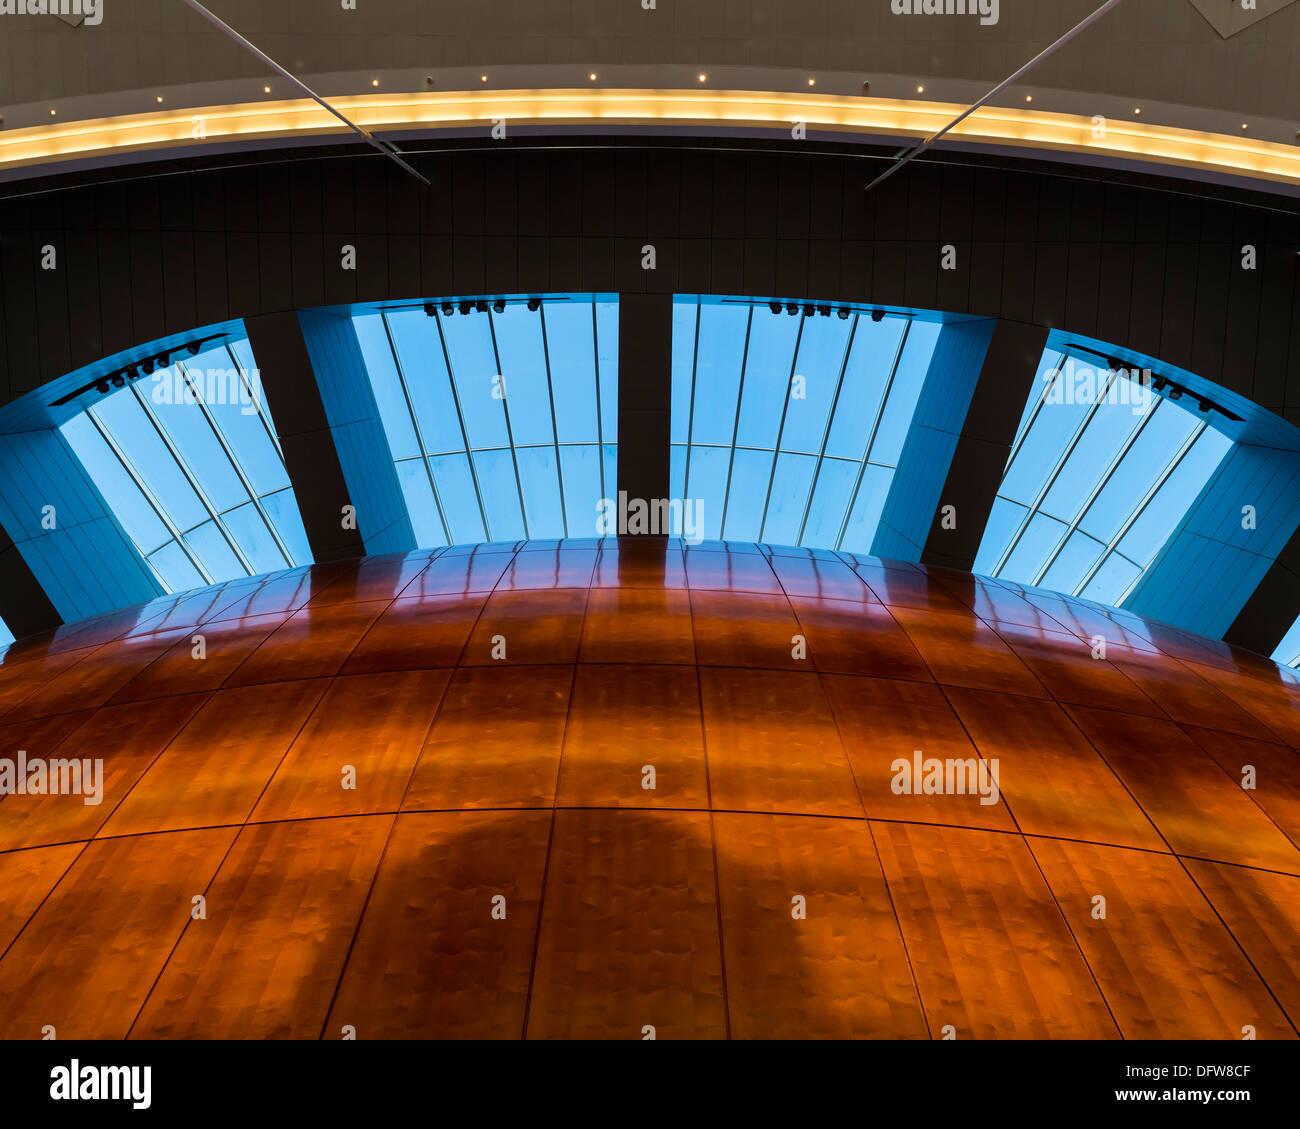 Copenhagen Opera House (Operaen), Copenhagen, Denmark. Architect: Henning Larsen, 2004. Stock Photo